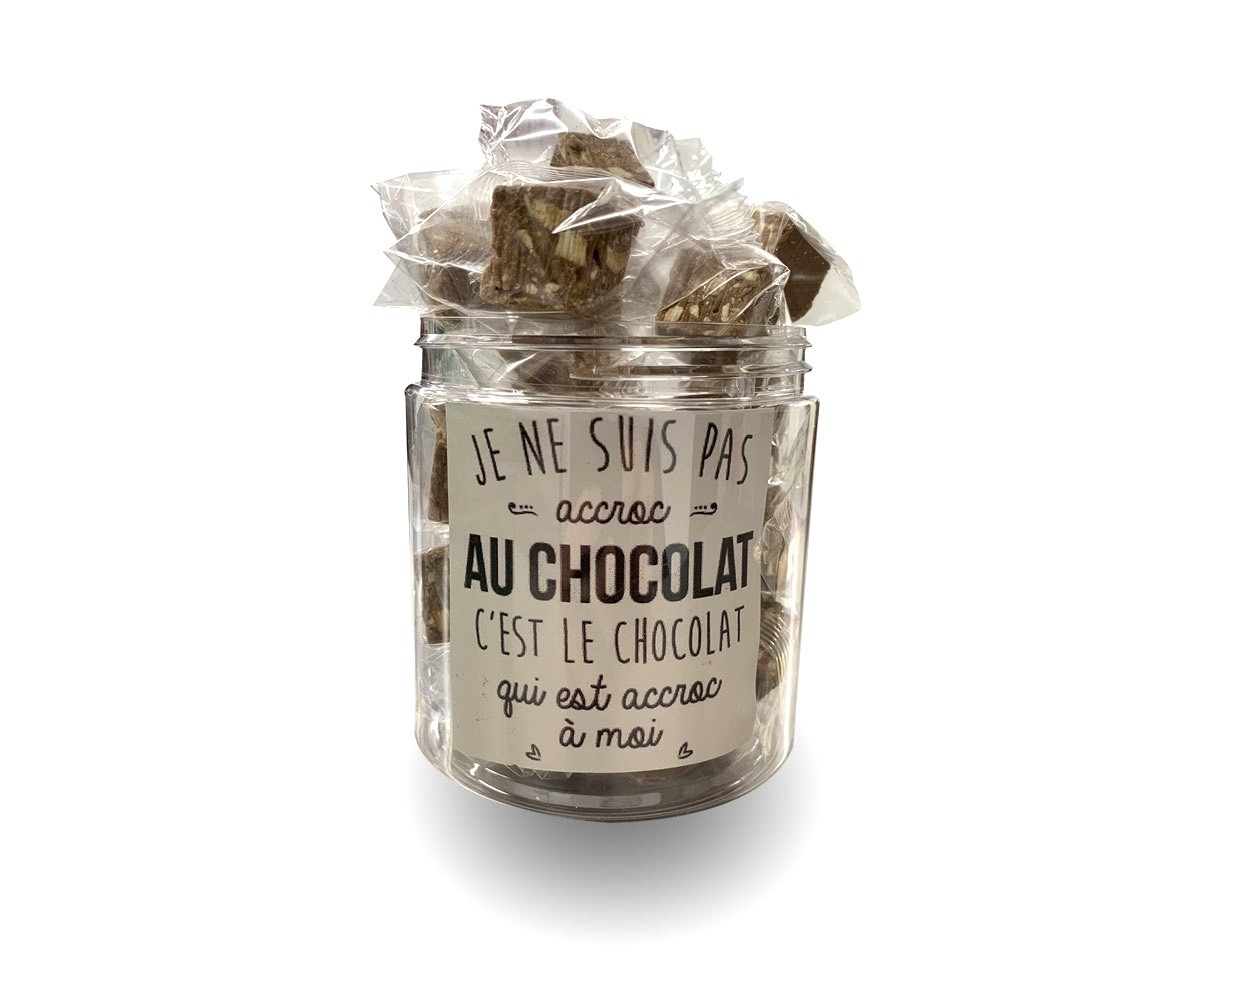 Pour Charlotte - Soeur Choco'addict du chocolat Made By Escobar